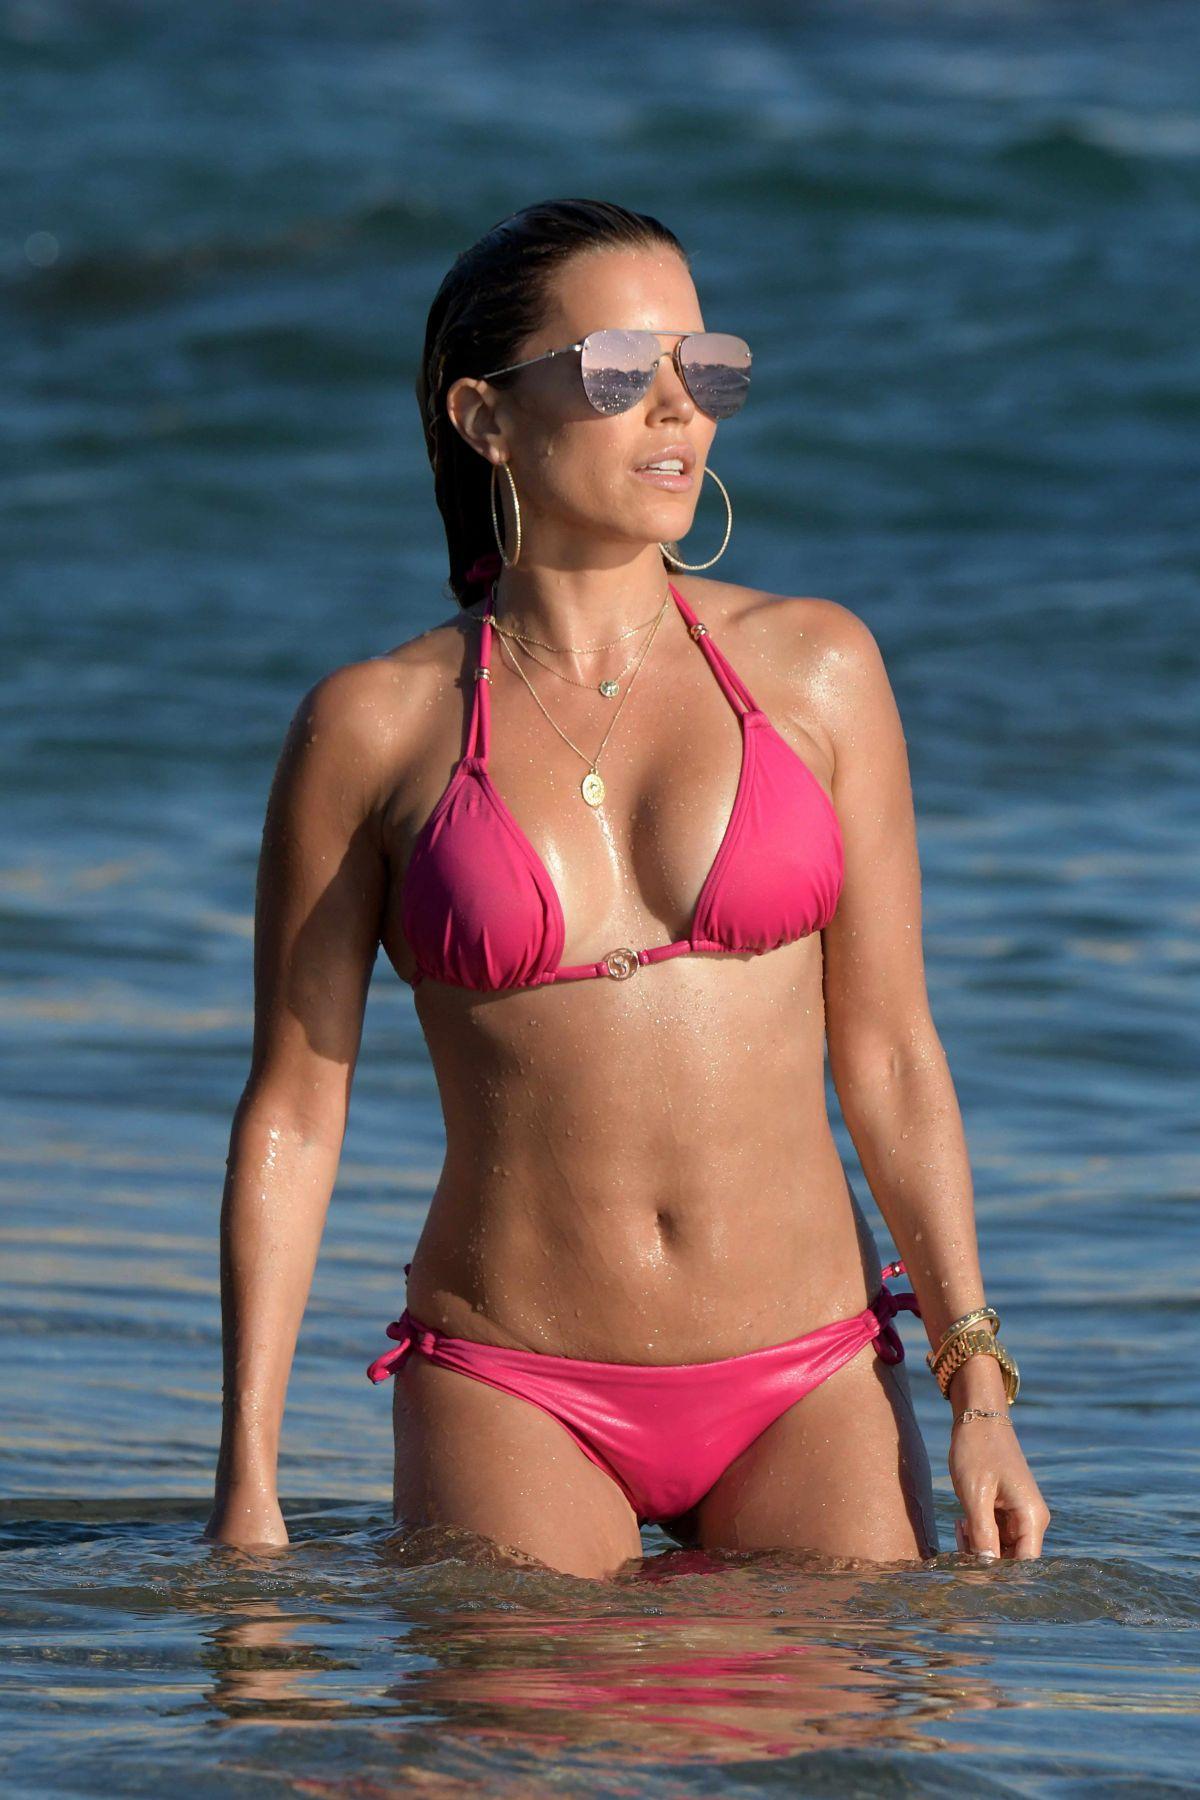 Spiksplinternieuw SYLVIE MEIS in Red Bikini on the Beach in Mykonos 07/12/2018 TN-51